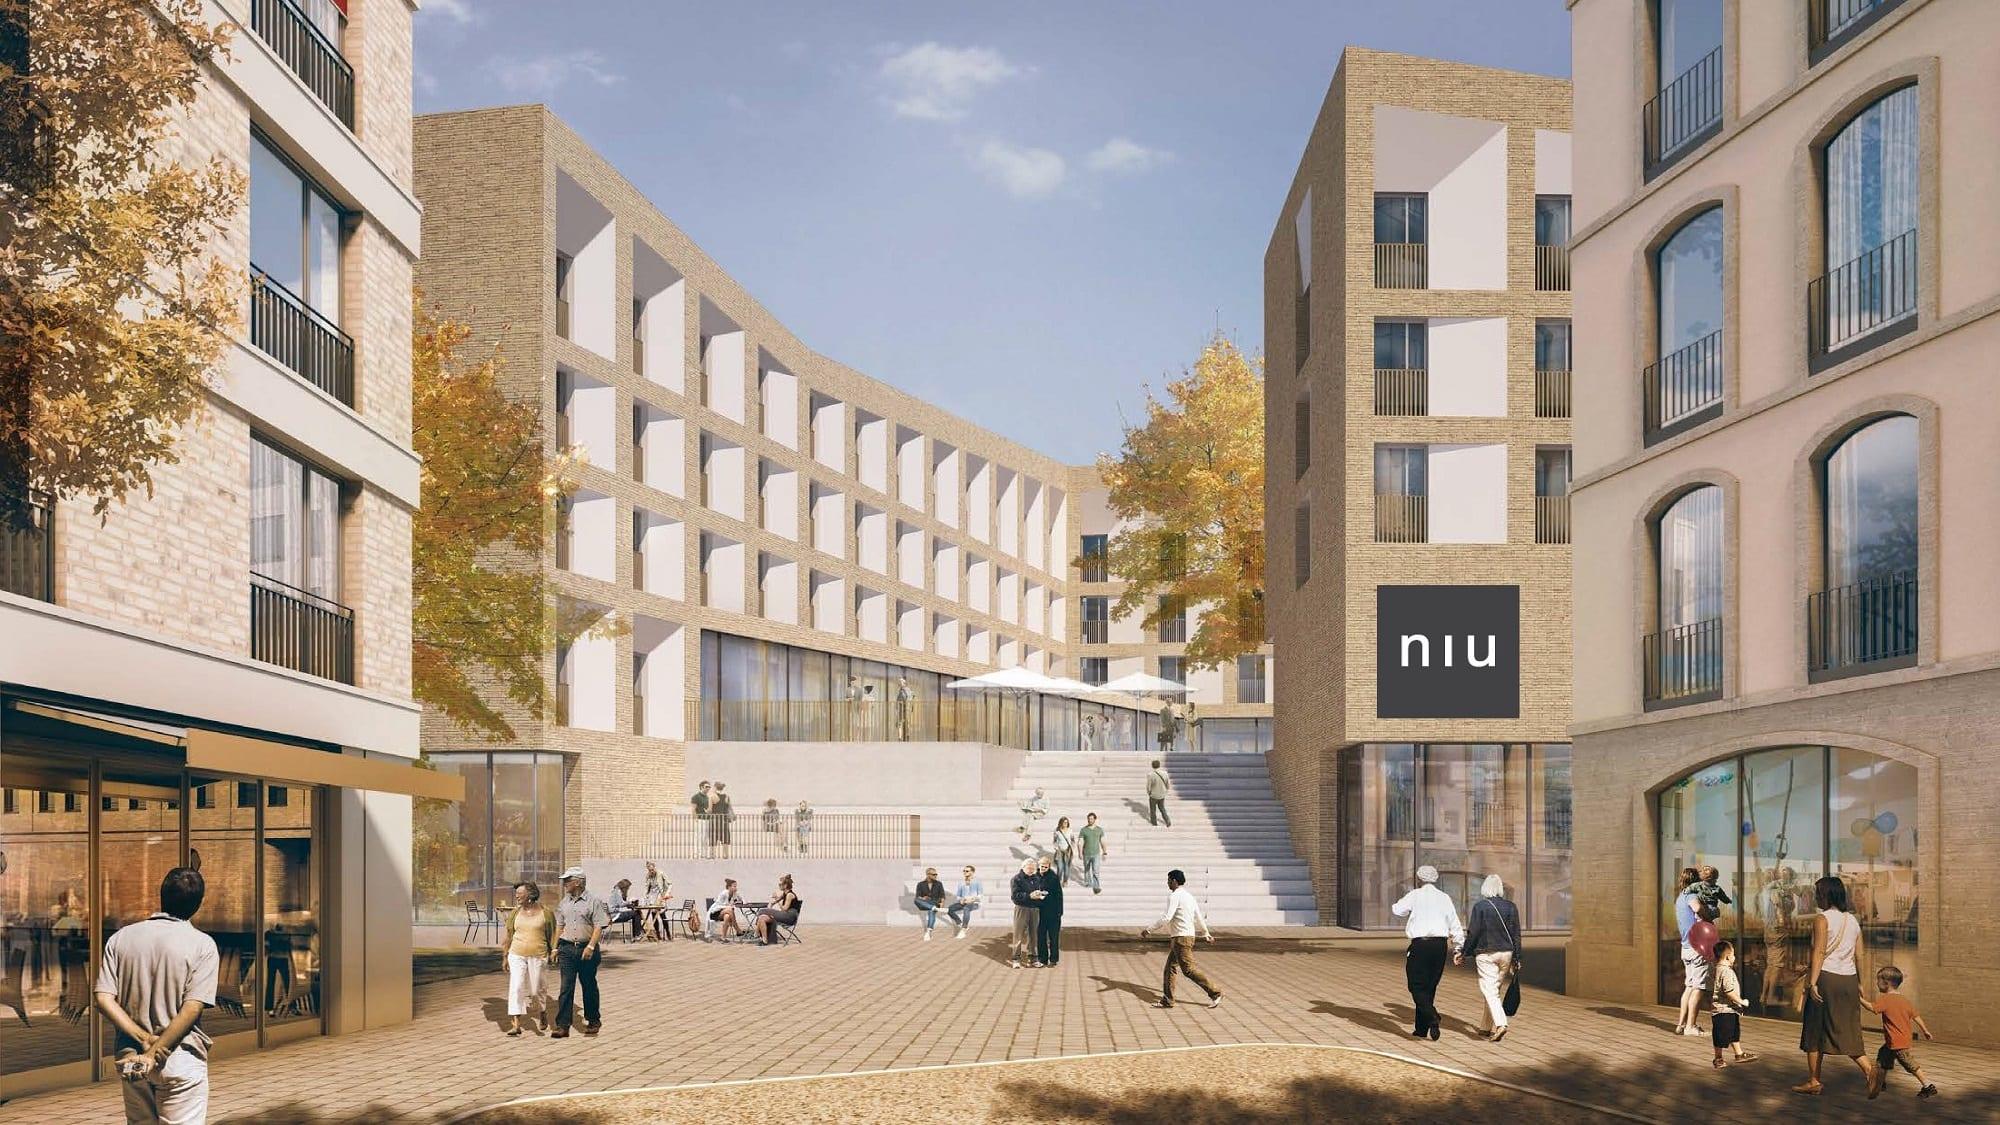 00 HQP Projektentwicklung Novum Hotels Potsdam Neue Webseite